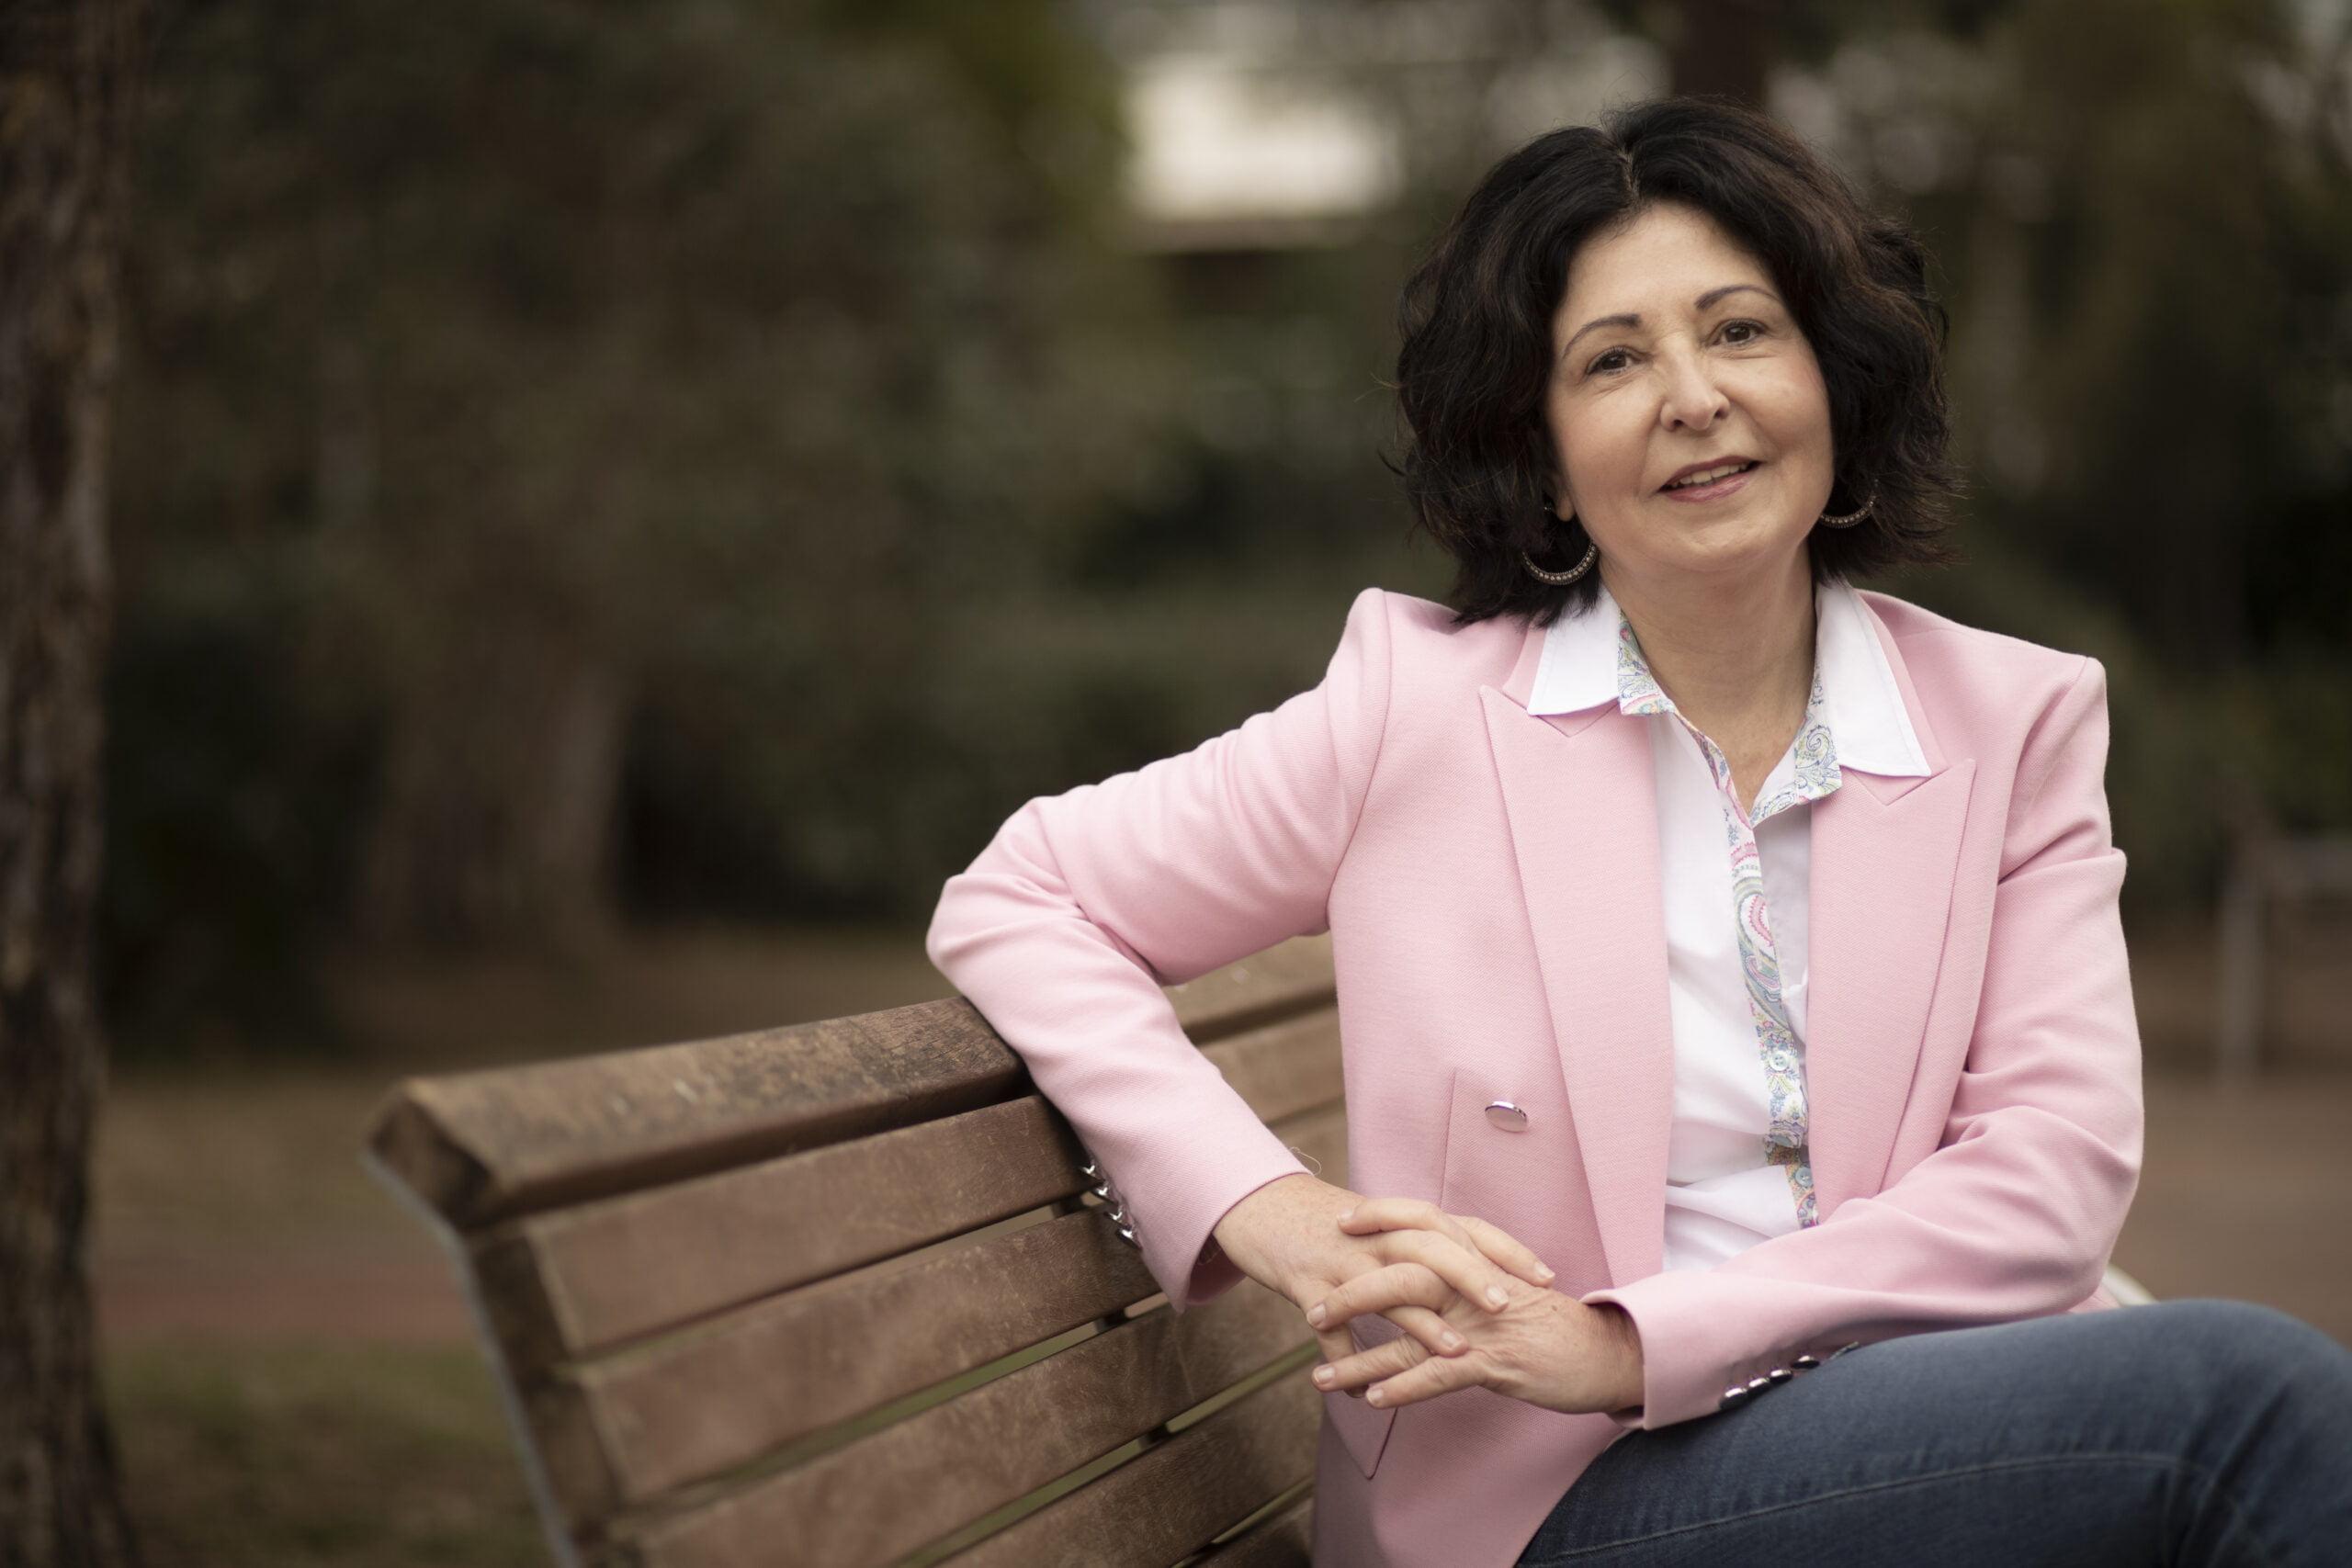 Teresa Baró comunicación efectiva para mujeres profesionales